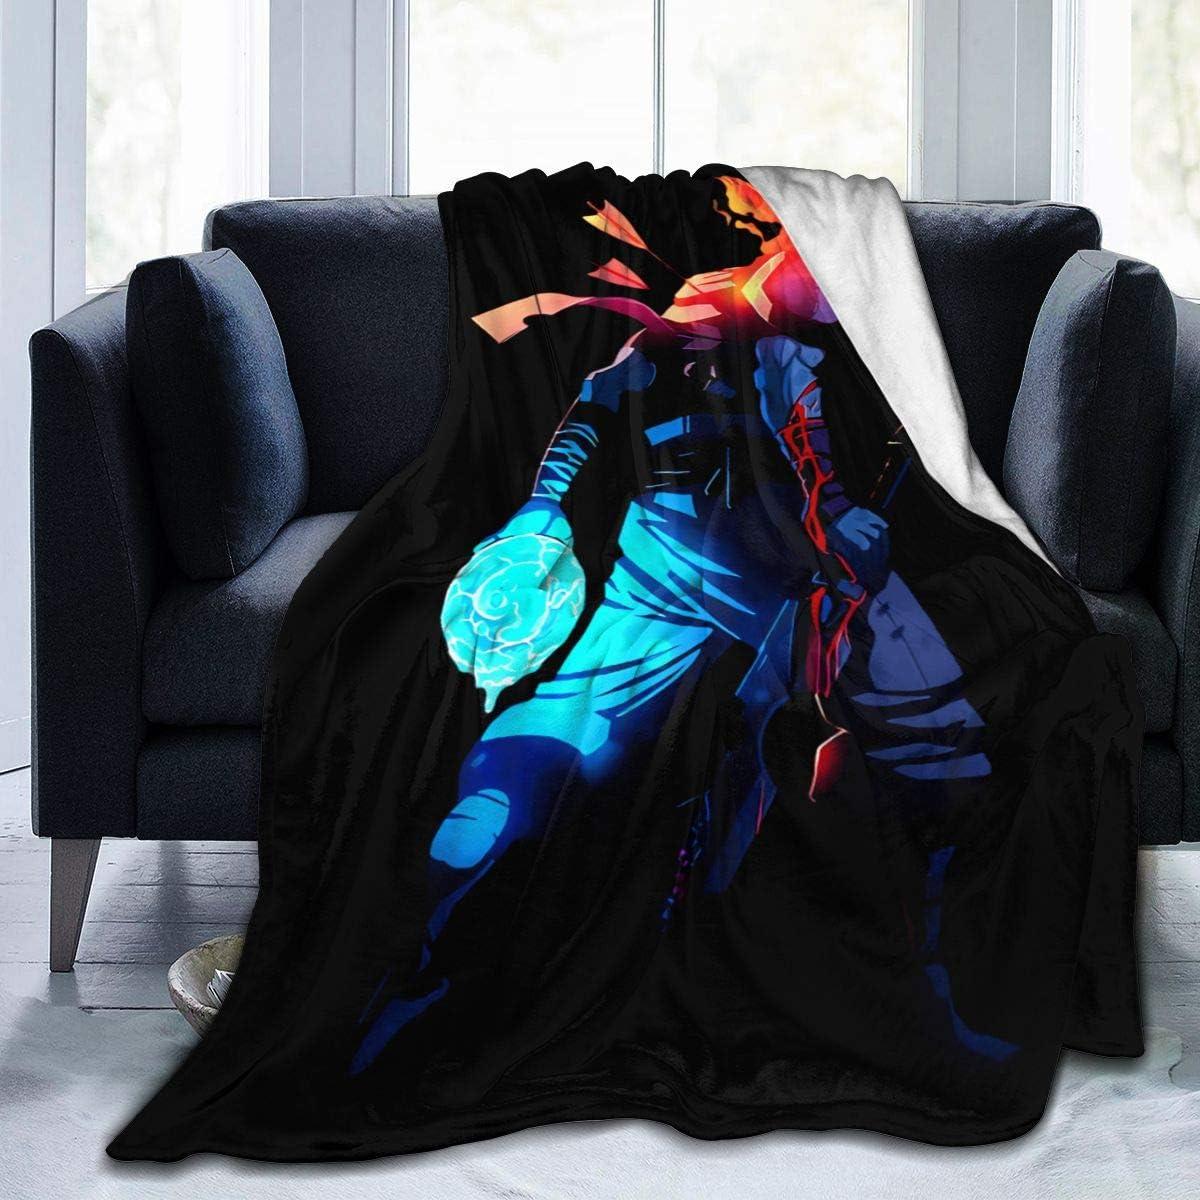 LMHBLTOP Dead Cells Fleece Blanket Flannel 使い勝手の良い Ultra-Soft Throw 捧呈 Blan